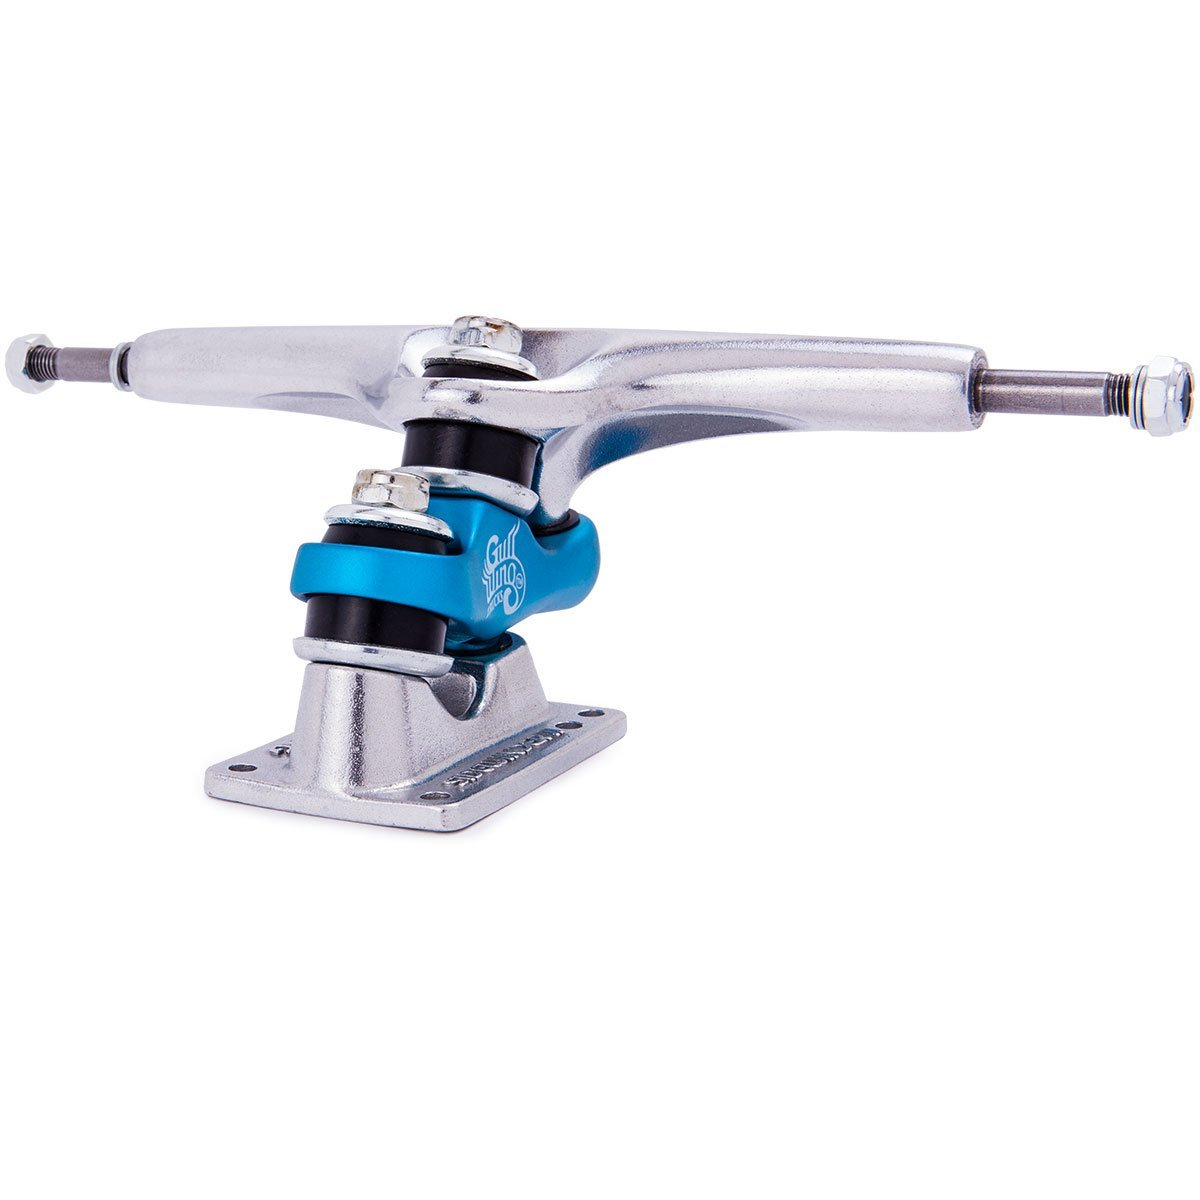 Gullwing Sidewinder II ロングボード スケートボードトラック - ブルー 10インチ B07G3KFBR9